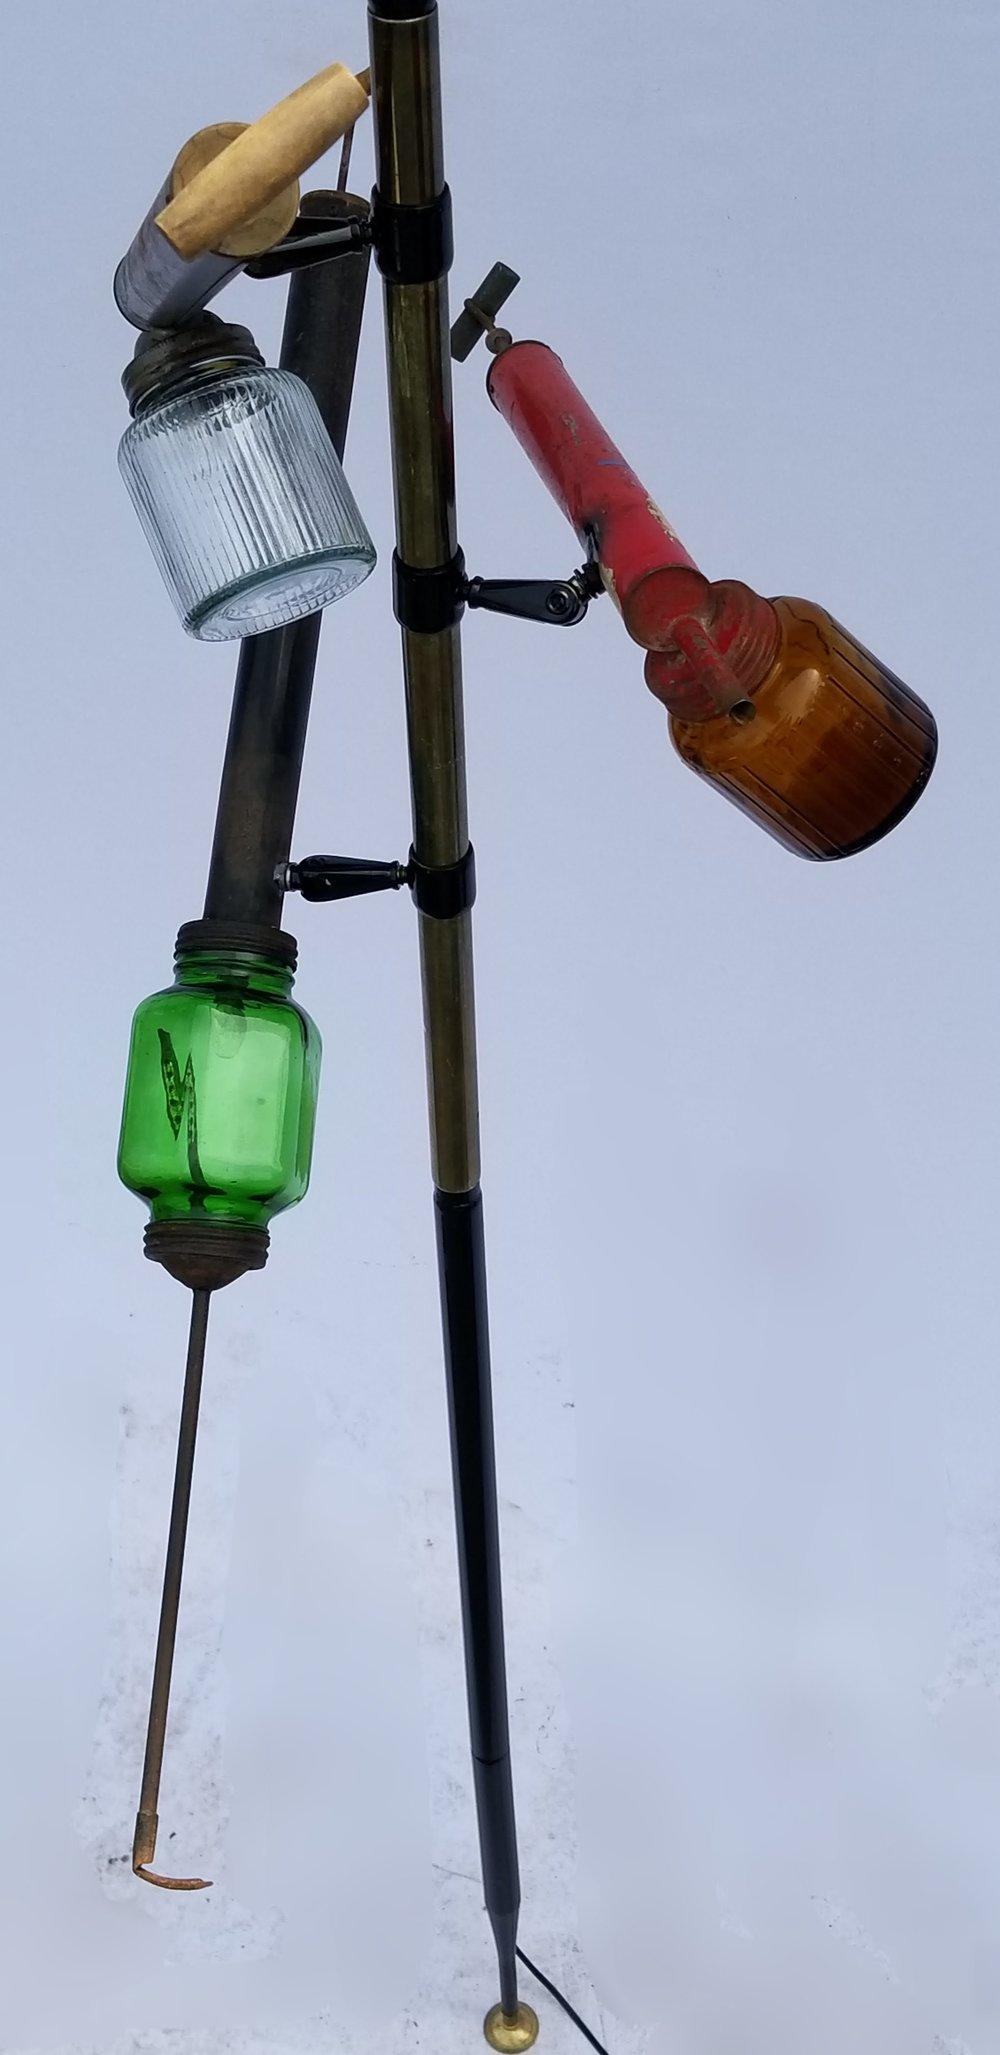 Vegetable Duster Pole Lamp